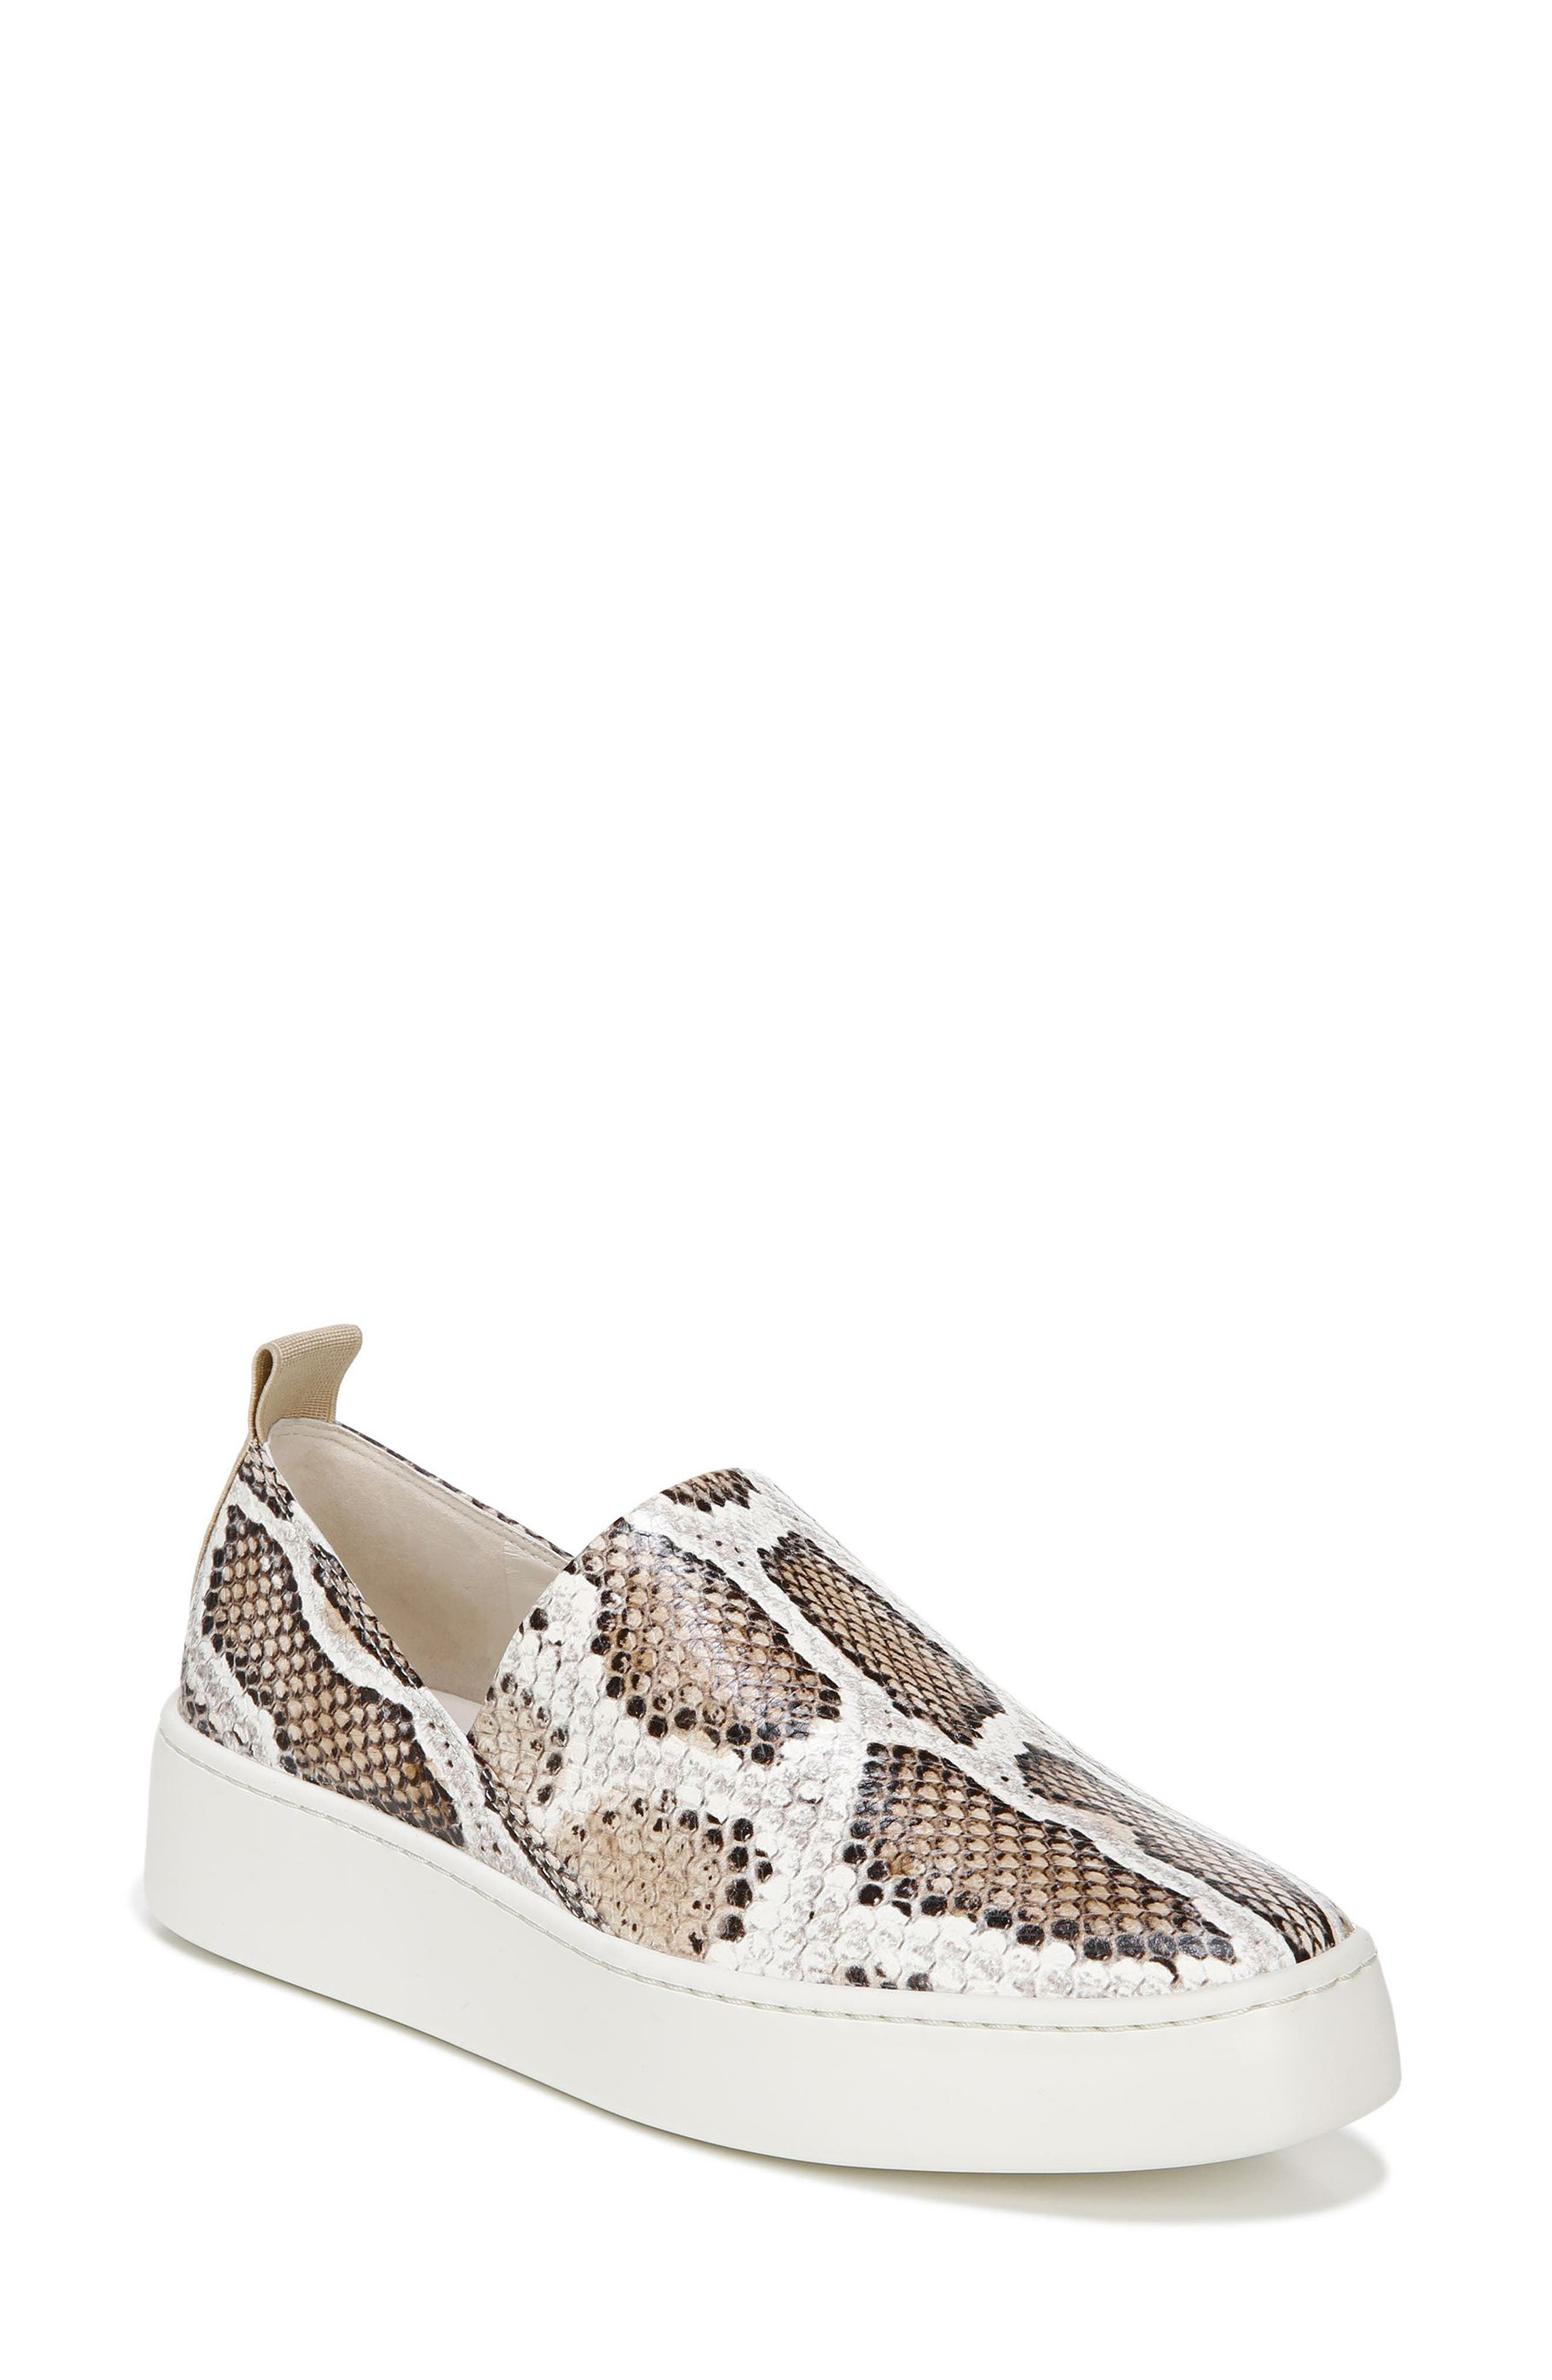 Vince Sneakers \u0026 Athletic Shoes | Nordstrom